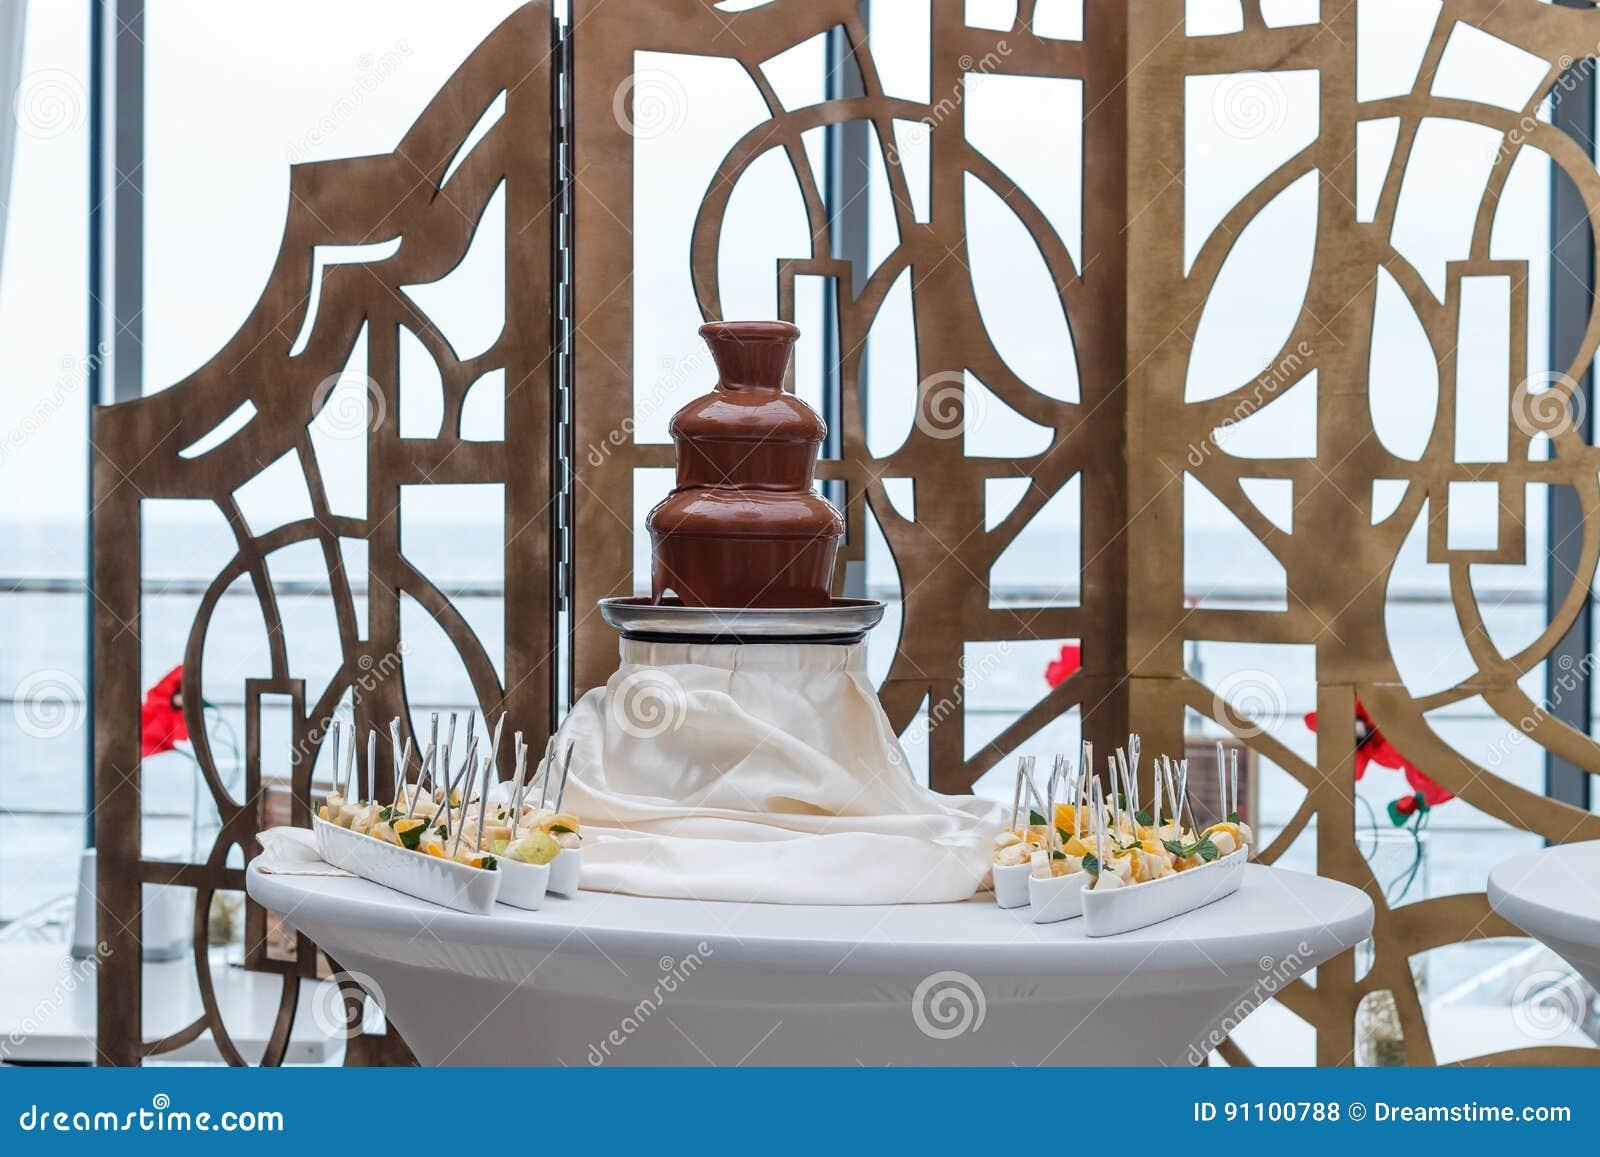 Amazing Chocolate Fountain Stock Photo Image Of Fountainn 91100788